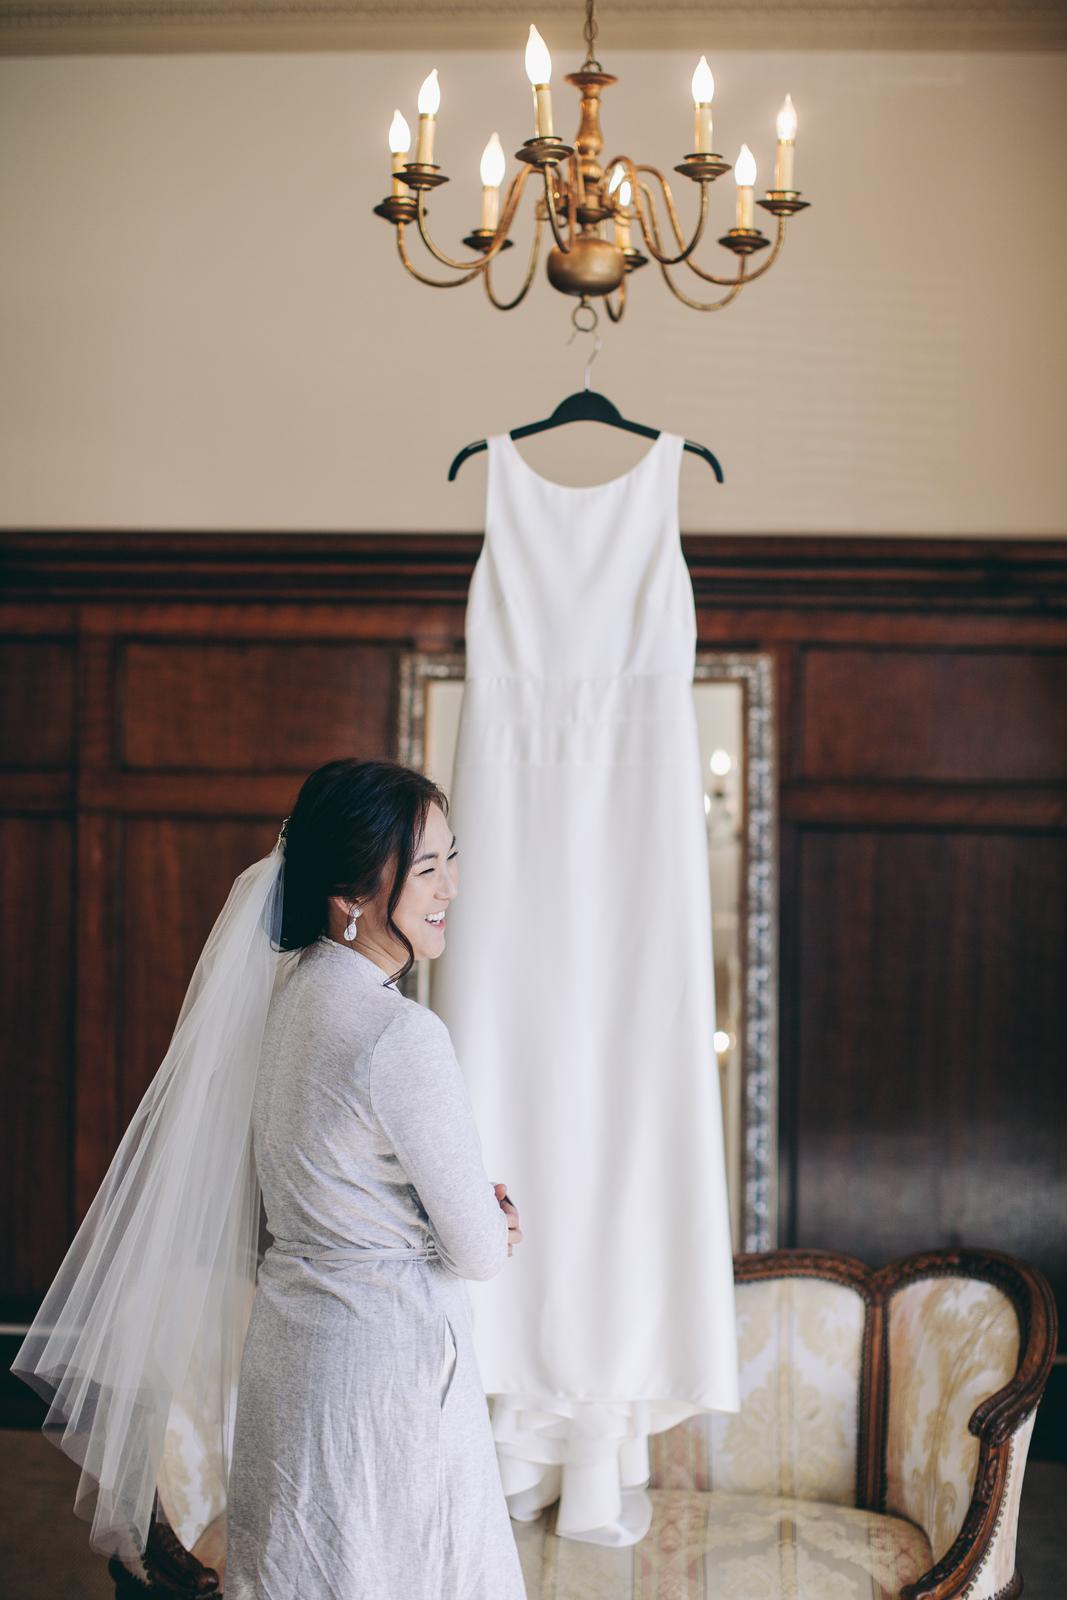 kohl_manison_wedding_photography_sarah_eric_ebony_siovhan_bokeh_photography_002.jpg